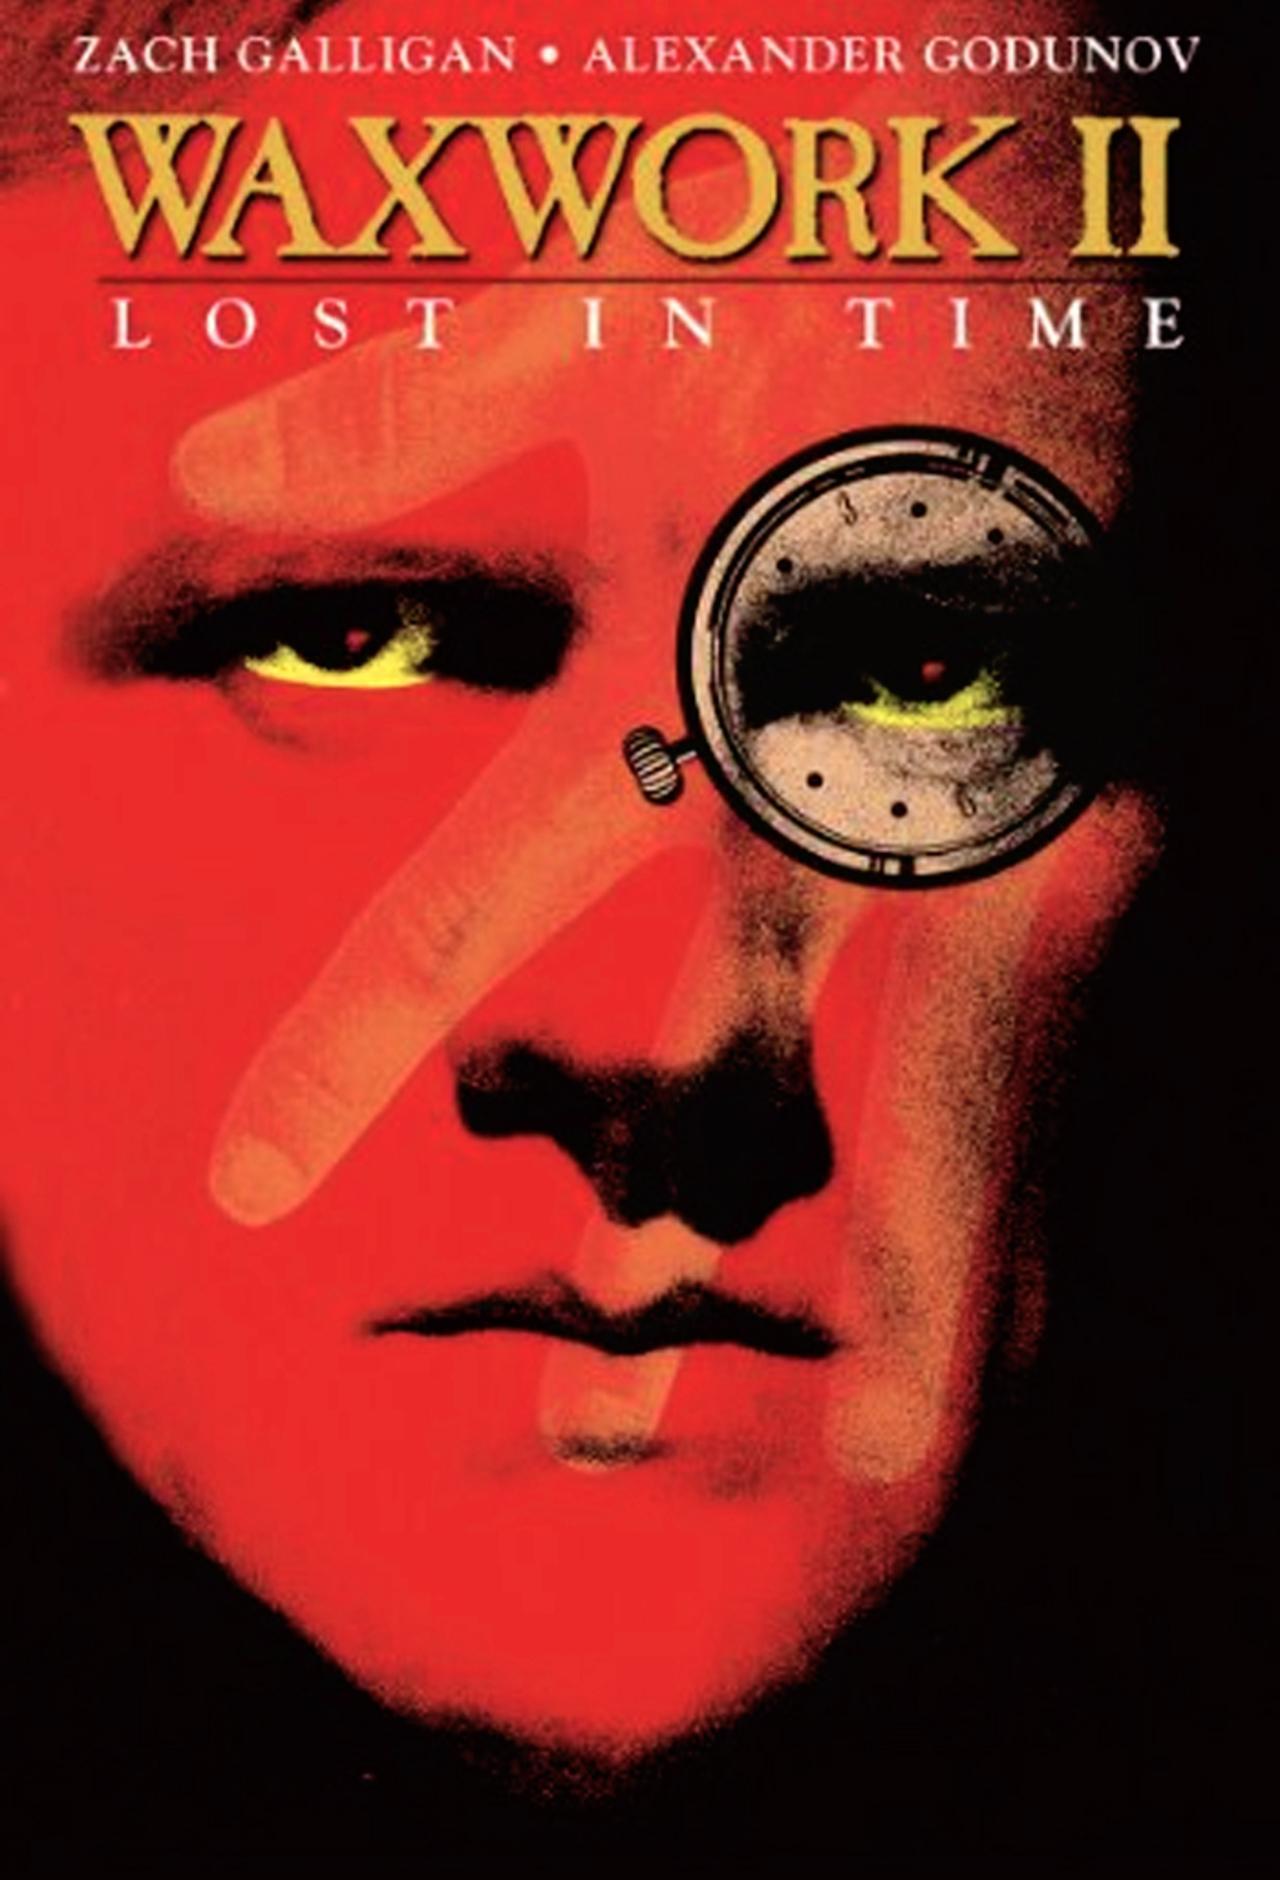 Waxwork II: Lost in Time kapak